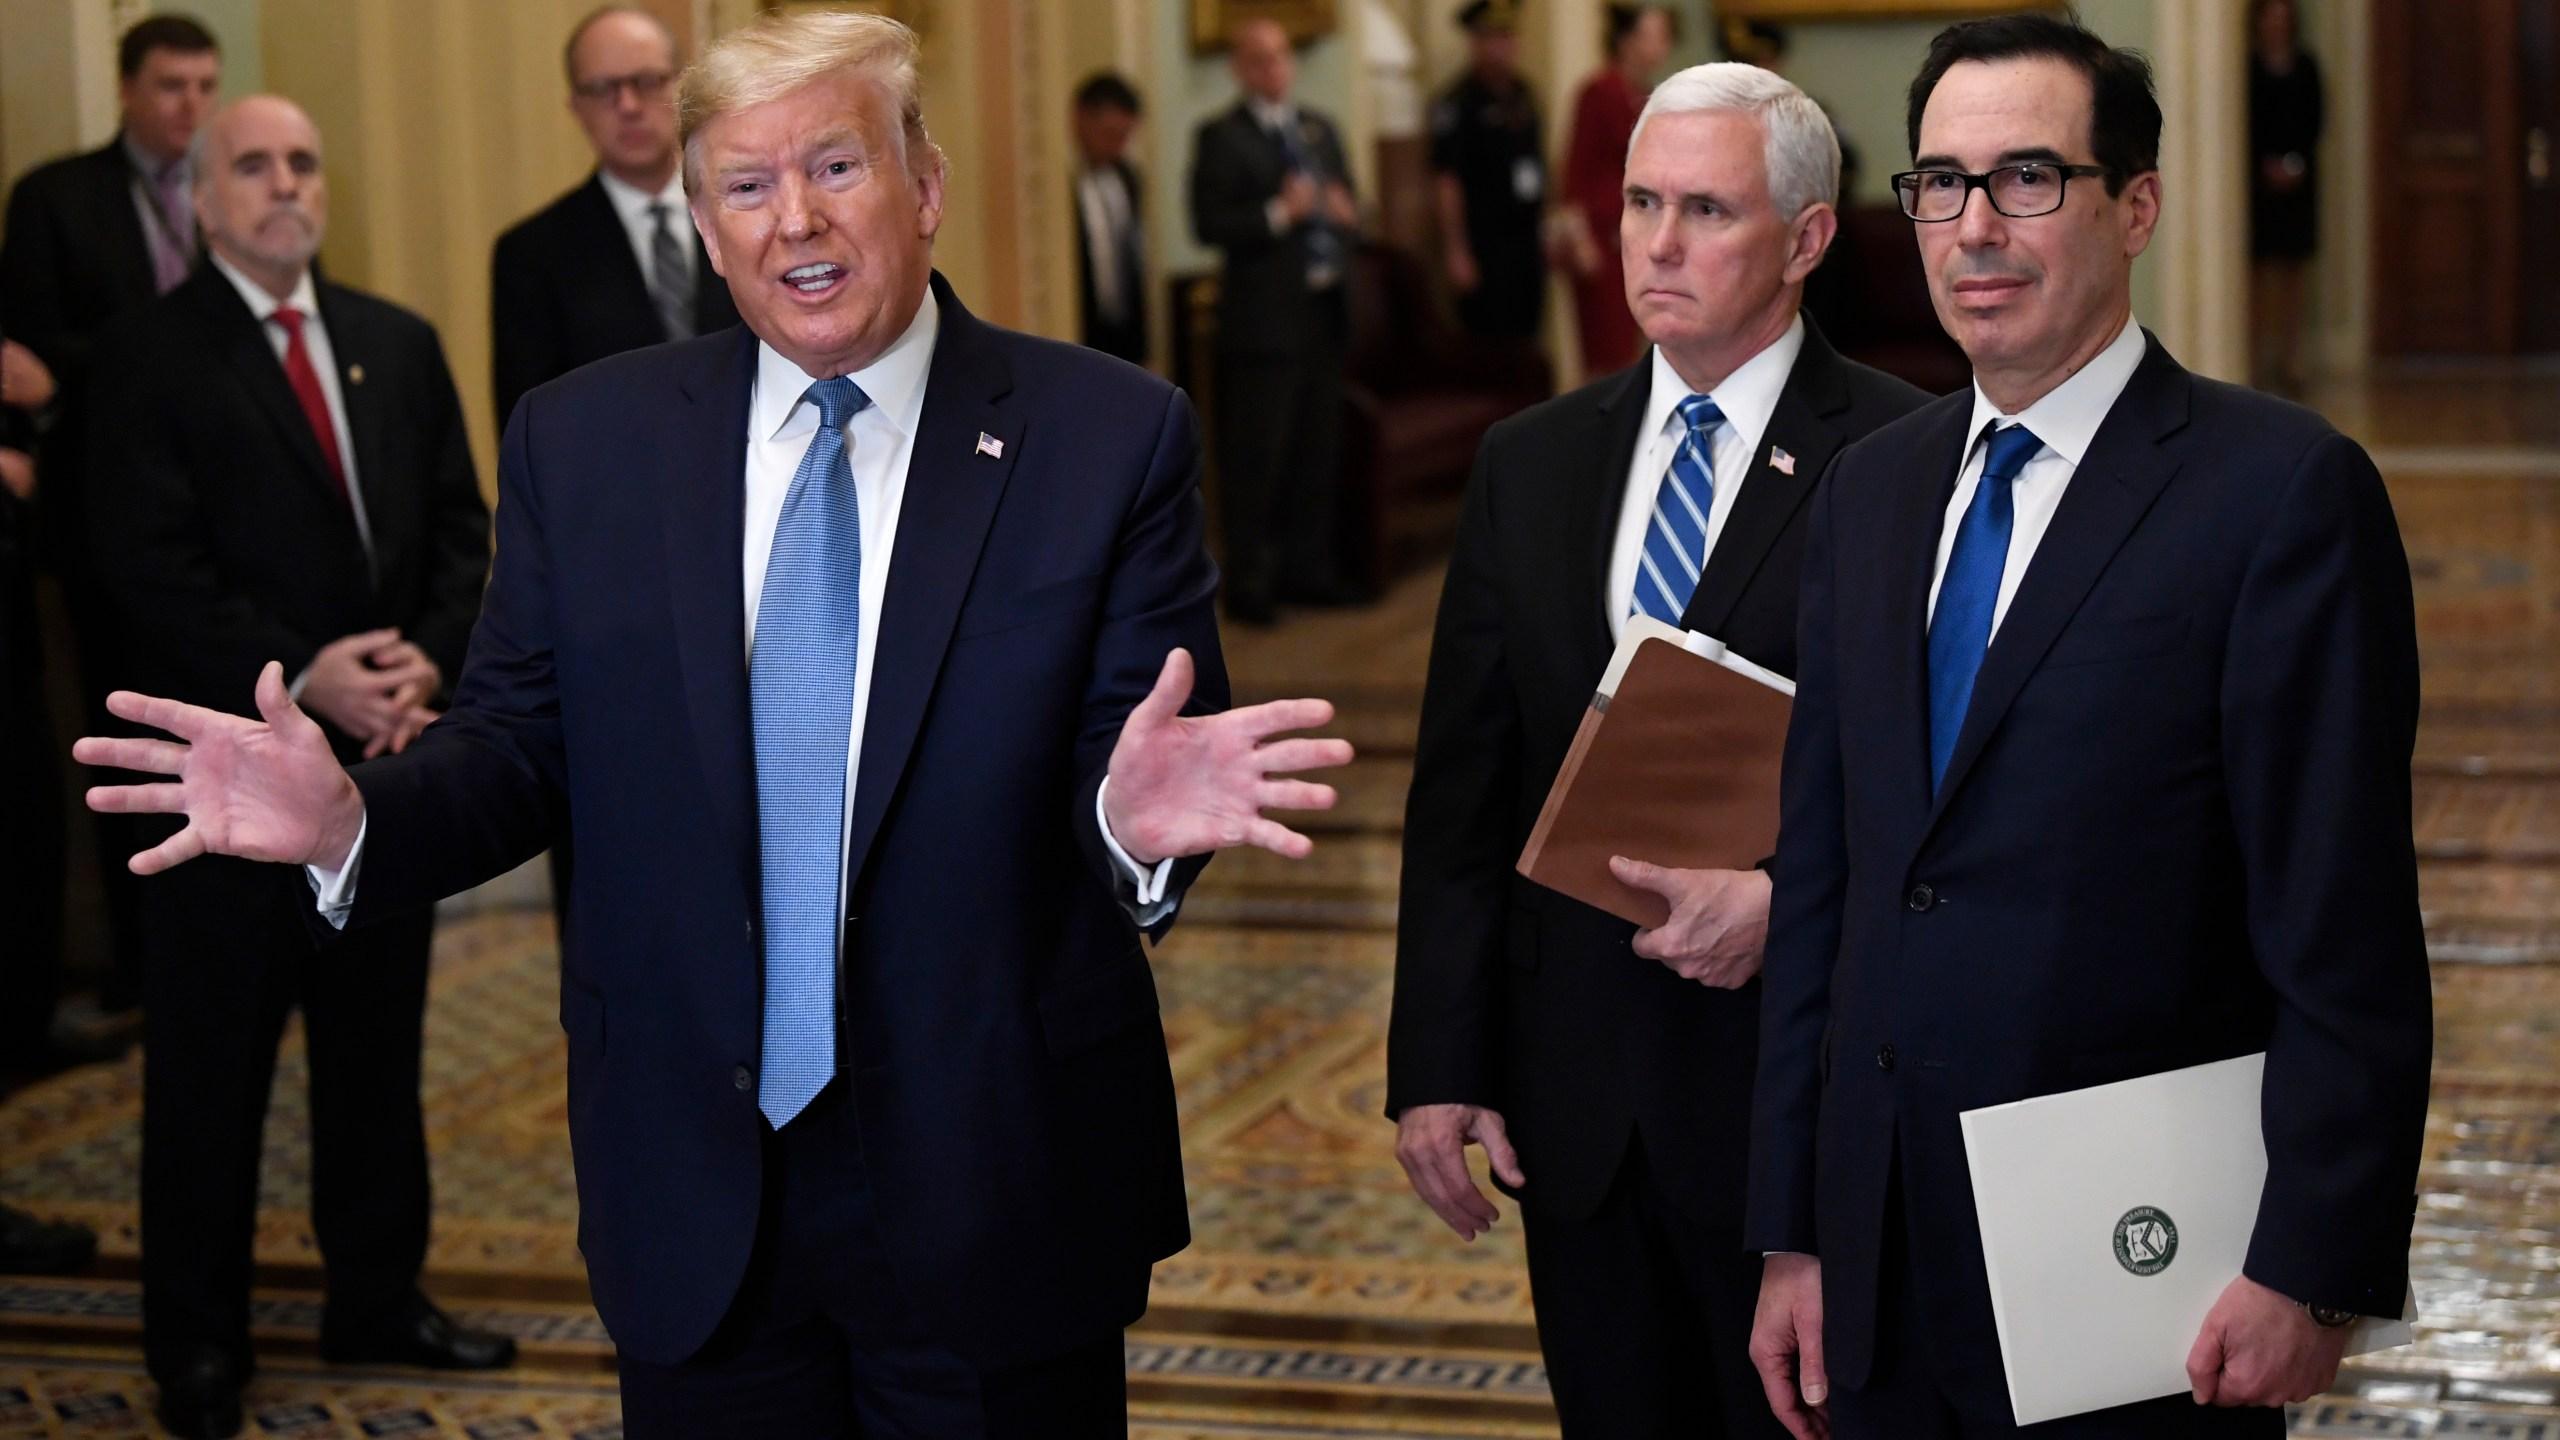 Donald Trump, Mike Pence, Steven Mnuchin